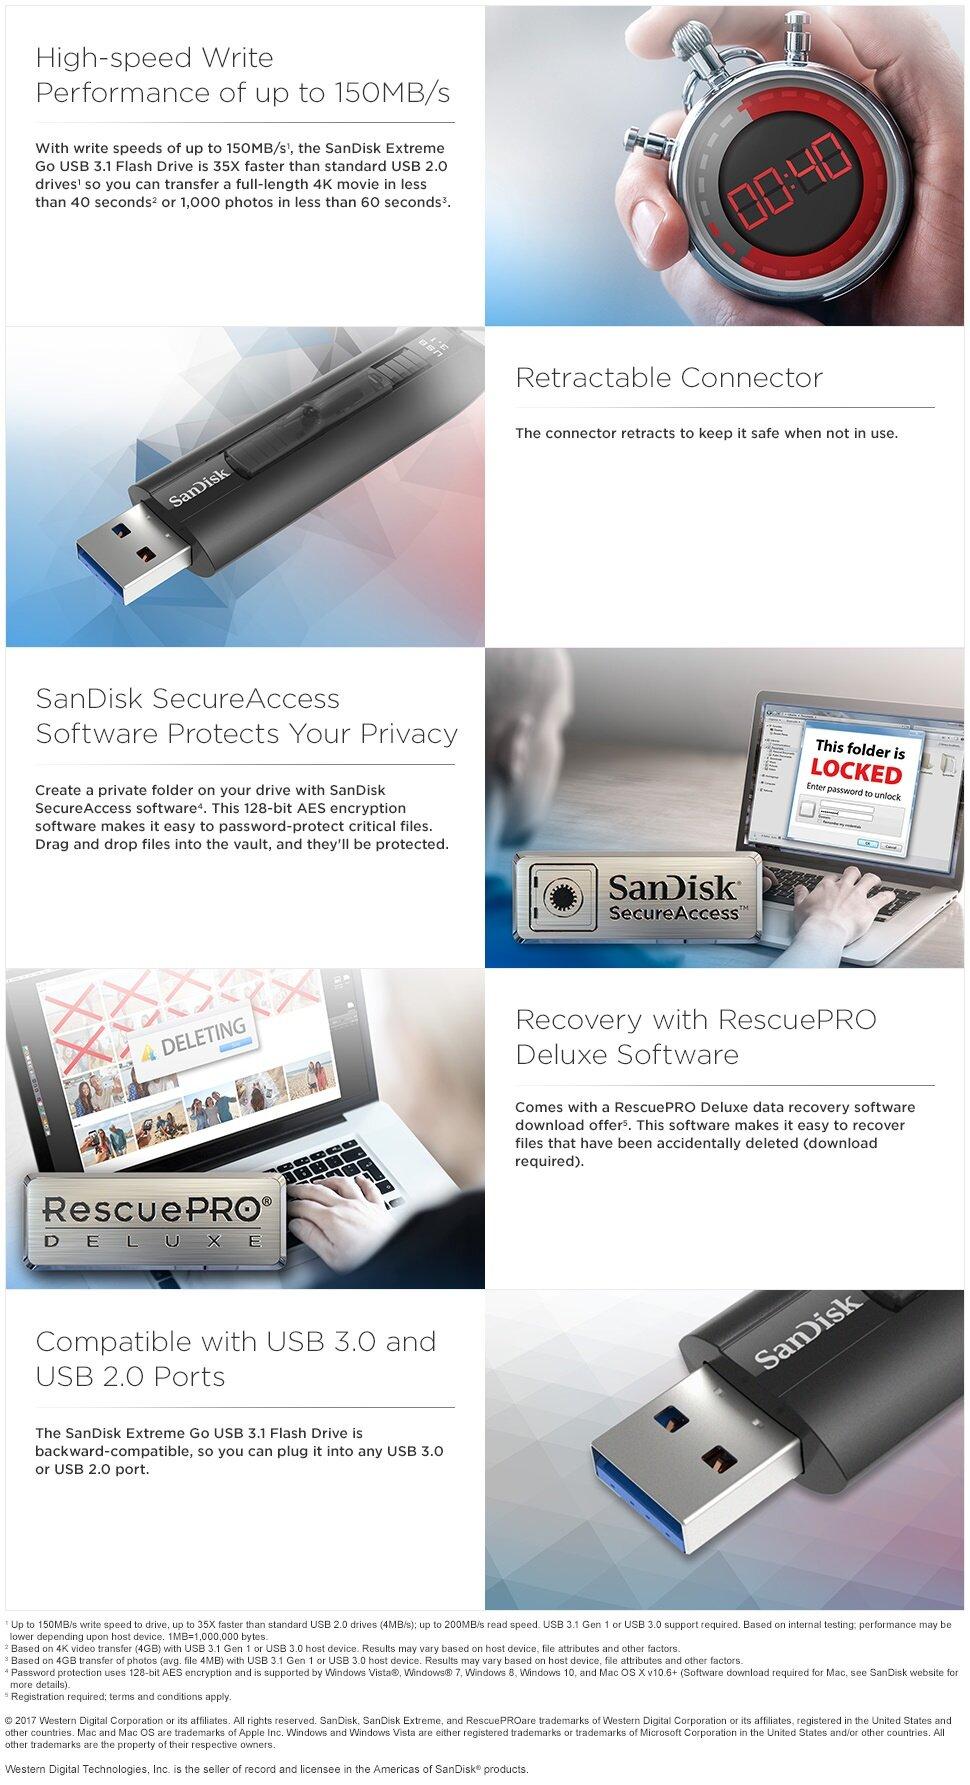 Sandisk Extreme Go 128gb 200mb S Usb 31 Flash Drive Cz800 Ultra 16gb Cz48 Disk 30 Original Https My Live 02slaticnet